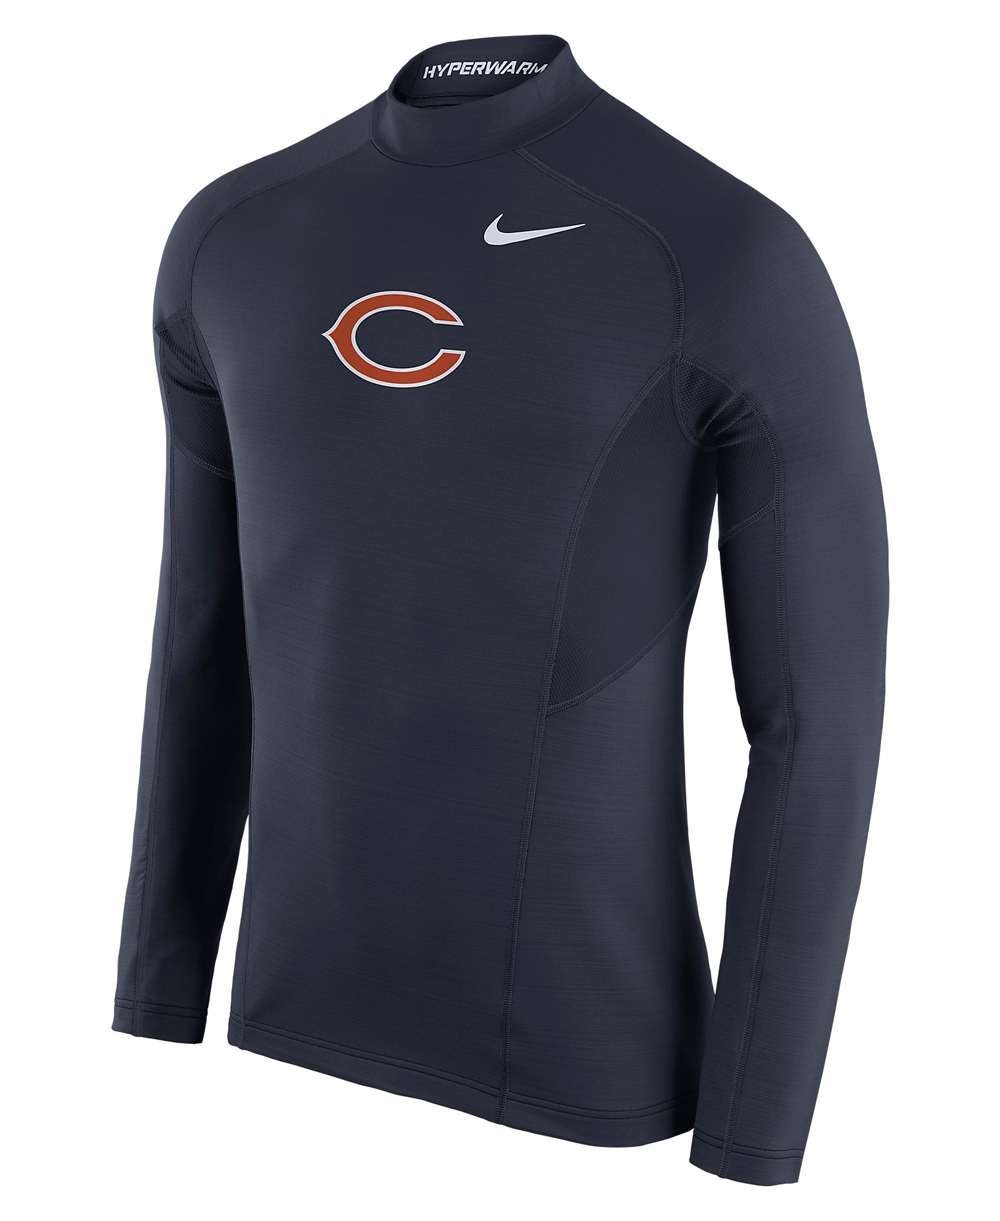 Pro Hyperwarm Max Fitted Herren Langarm Kompressions-Shirt  NFL Bears